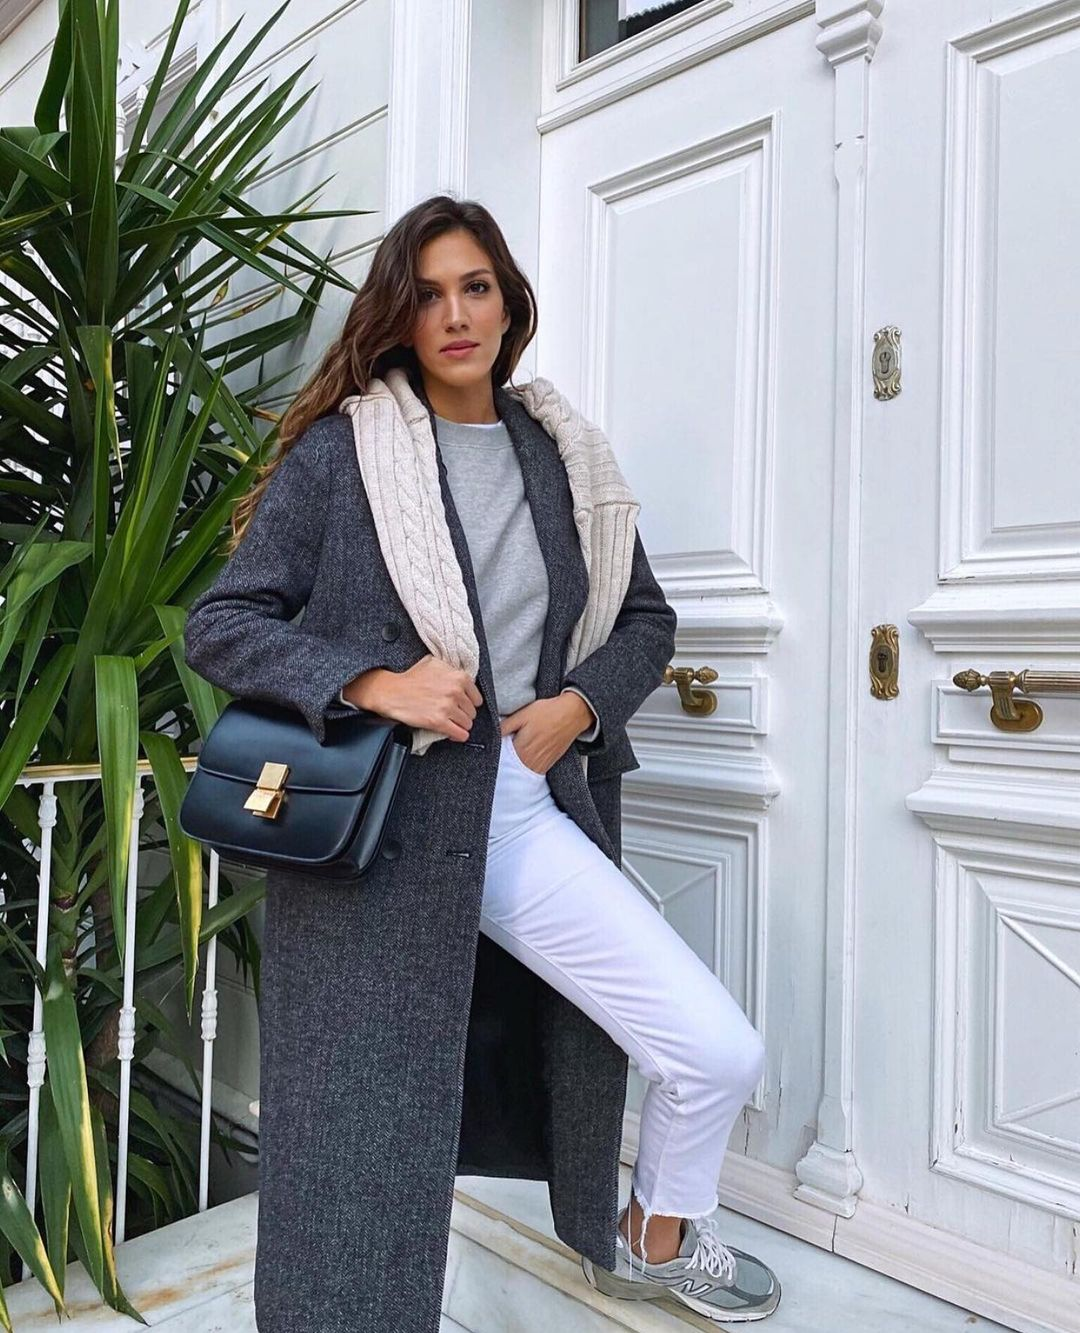 manteau masculin avec laine de Zara sur zara.outfits